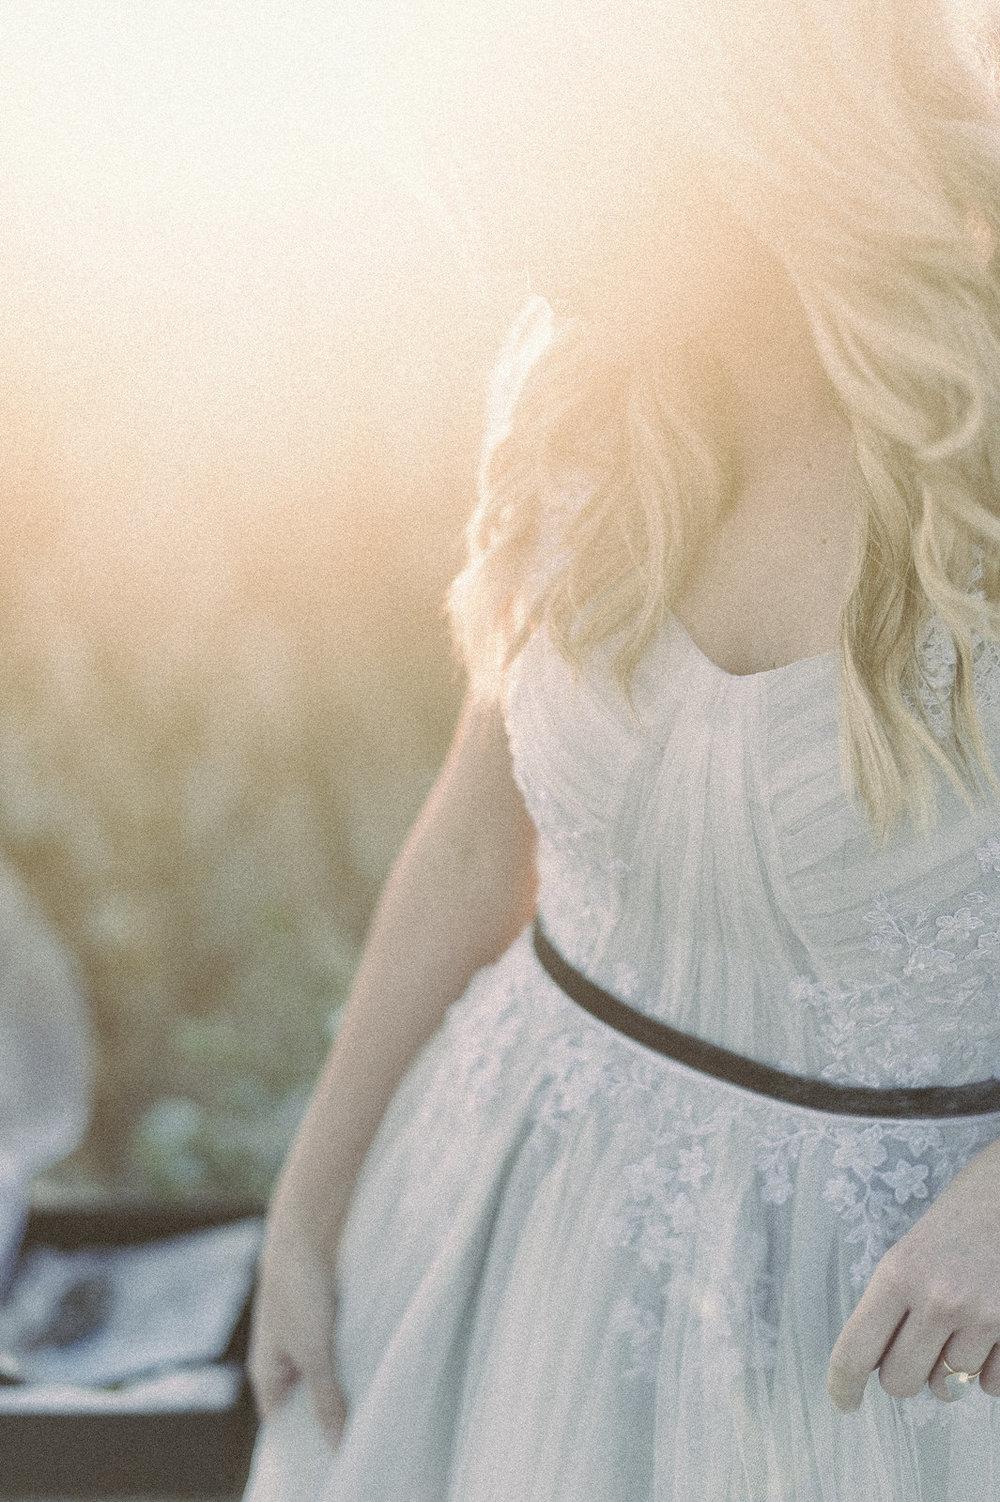 RyanParker_Wedding_Photographer_CapeTown_Hermanus_StyledShoot_DSC_6048.jpg